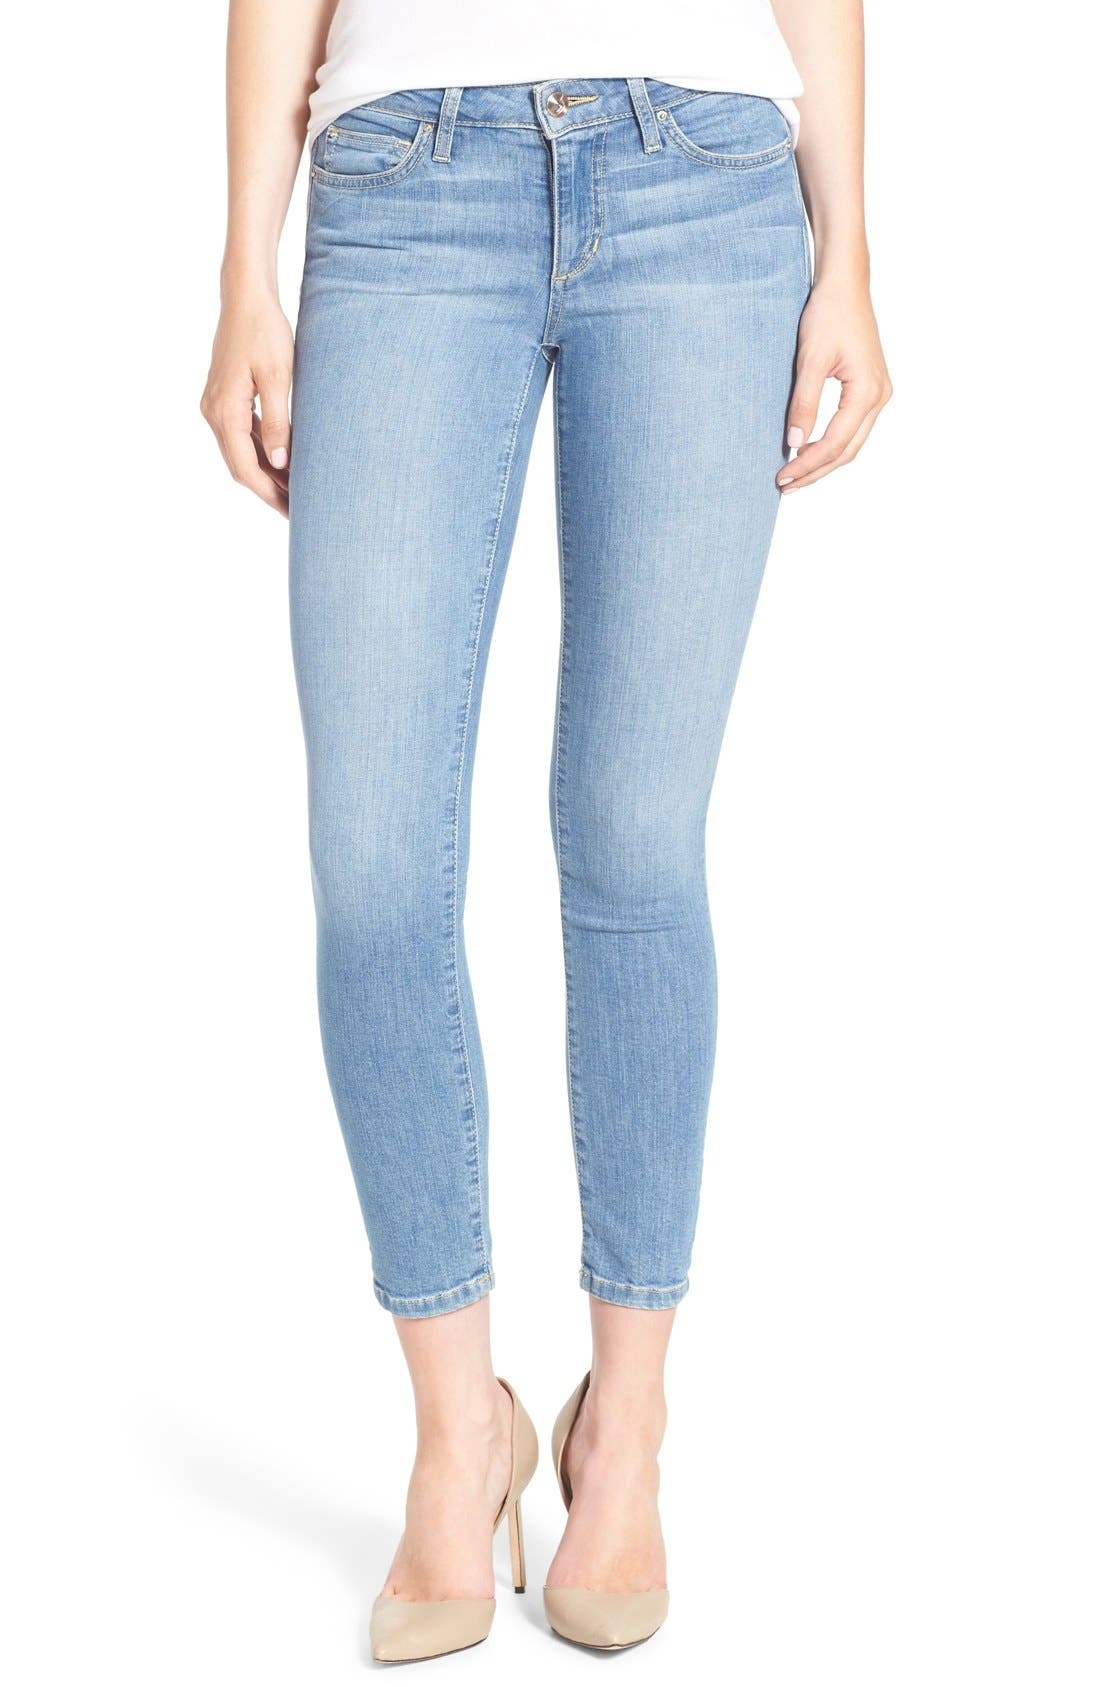 Main Image - Joe's 'Vixen' Ankle Skinny Jeans with Phone Pocket (Mitzi)